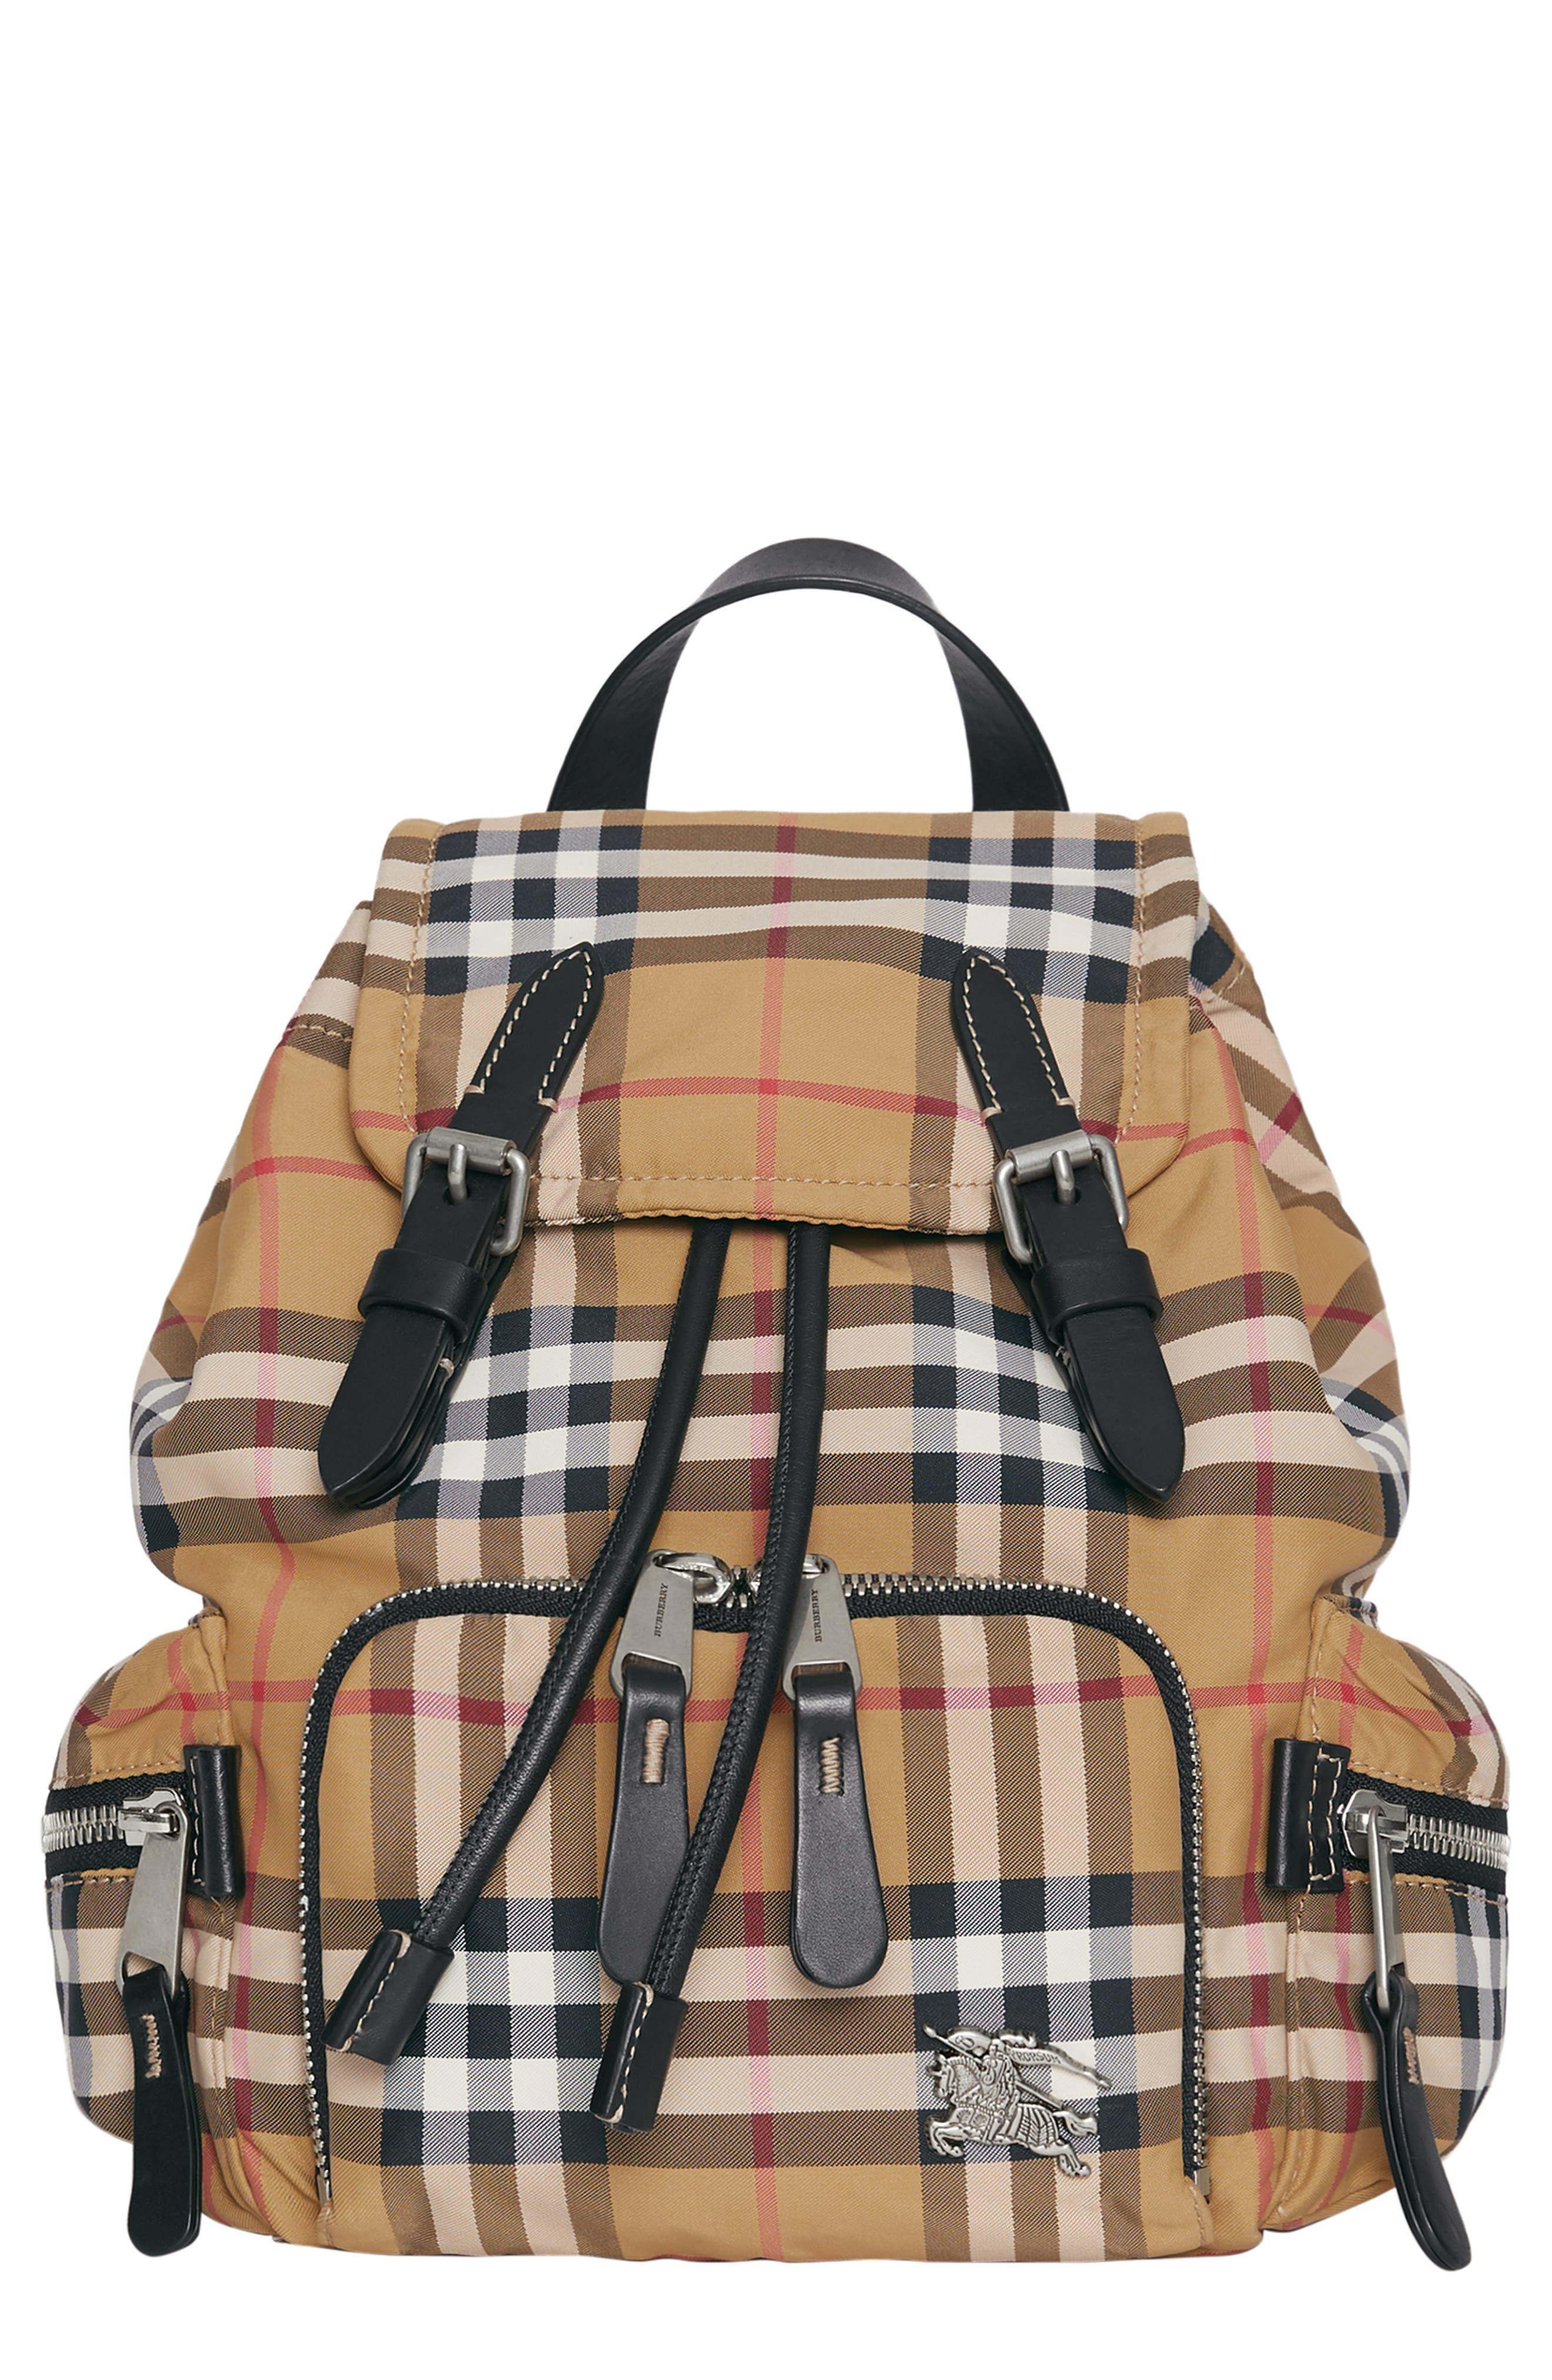 Small Rucksack Vintage Check Nylon Backpack,                             Main thumbnail 1, color,                             ANTIQUE YELLOW/ BLACK